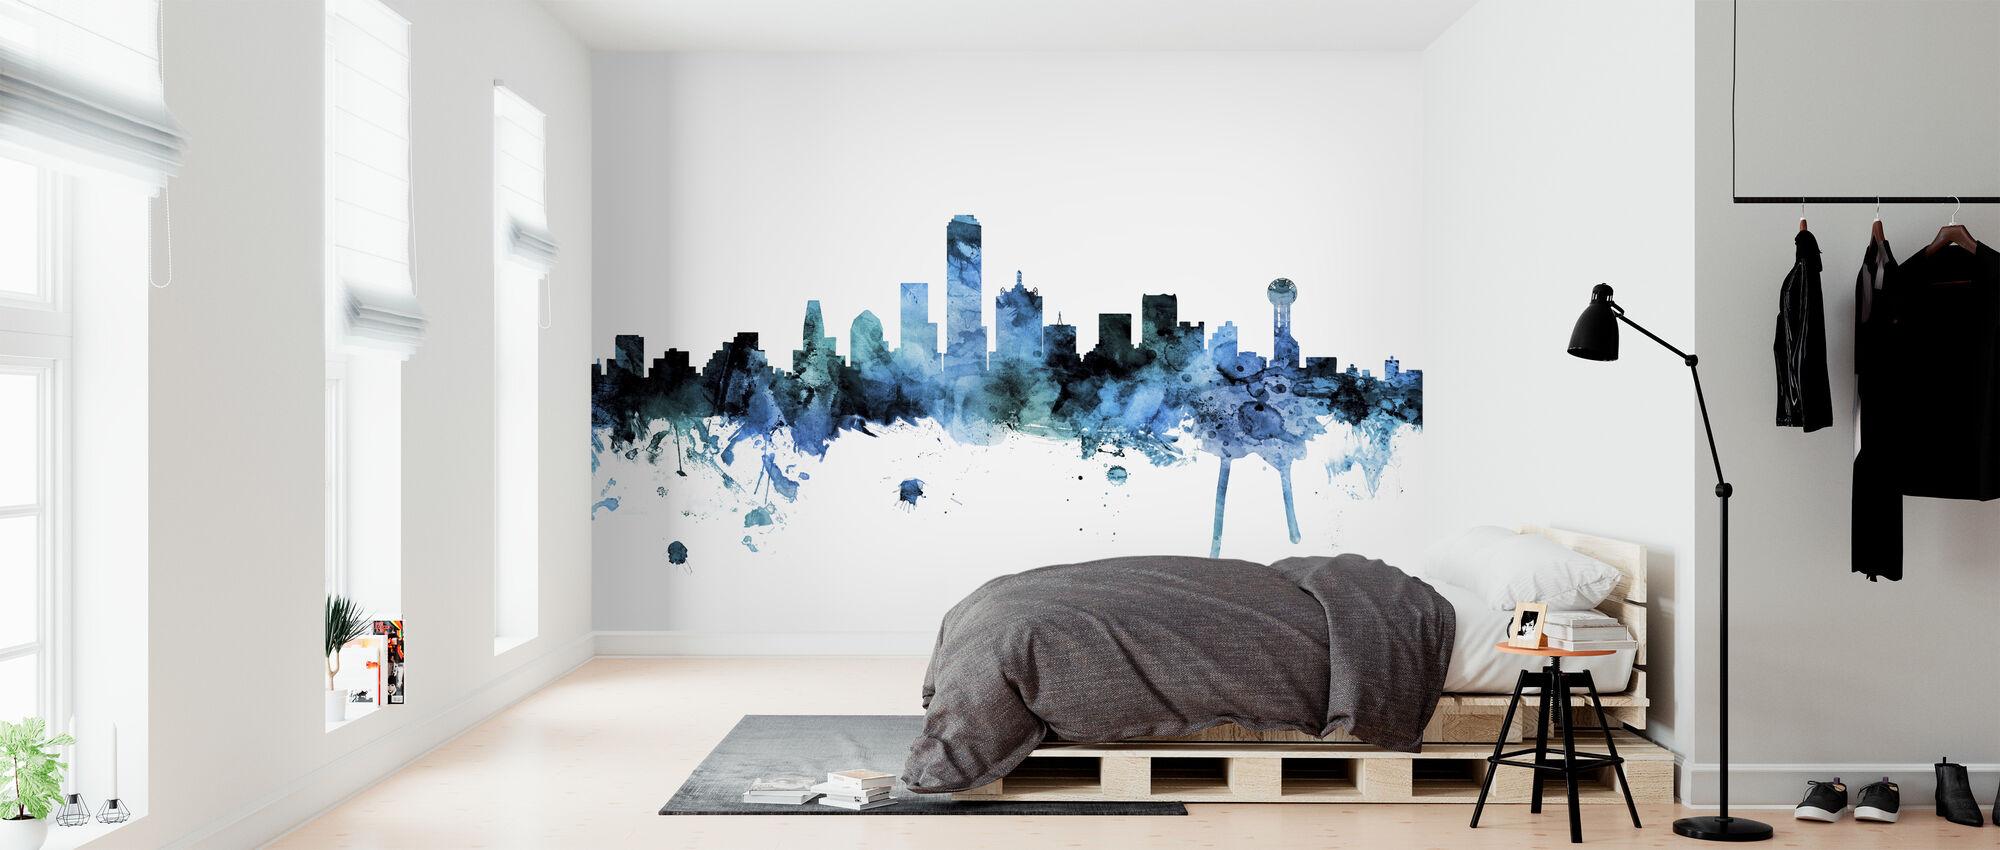 Dallas Texas Skyline - Wallpaper - Bedroom